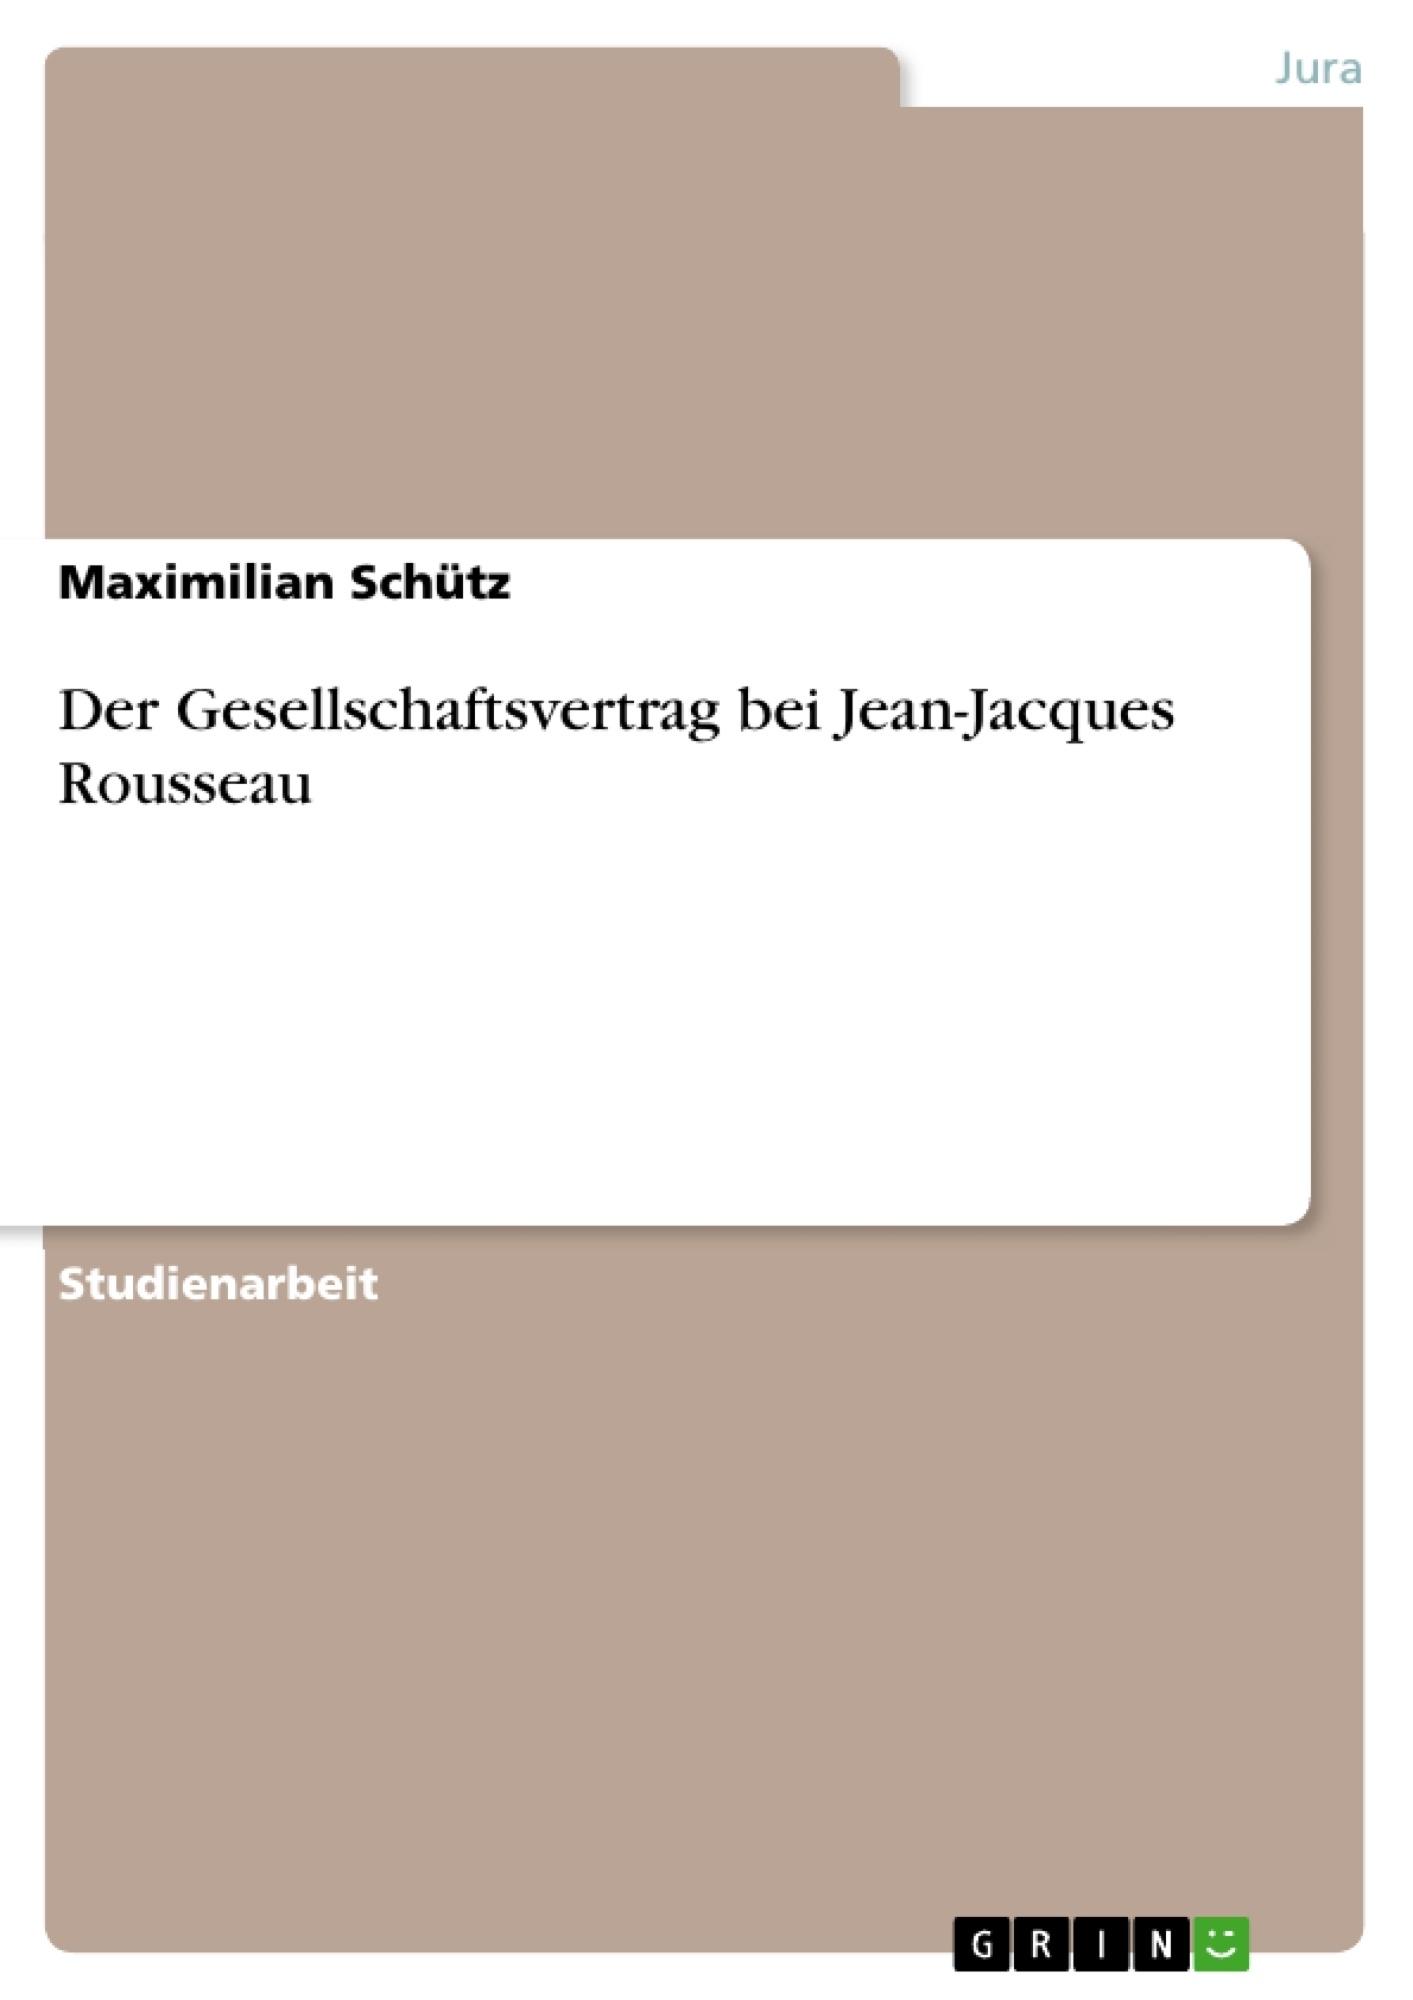 Titel: Der Gesellschaftsvertrag bei Jean-Jacques Rousseau